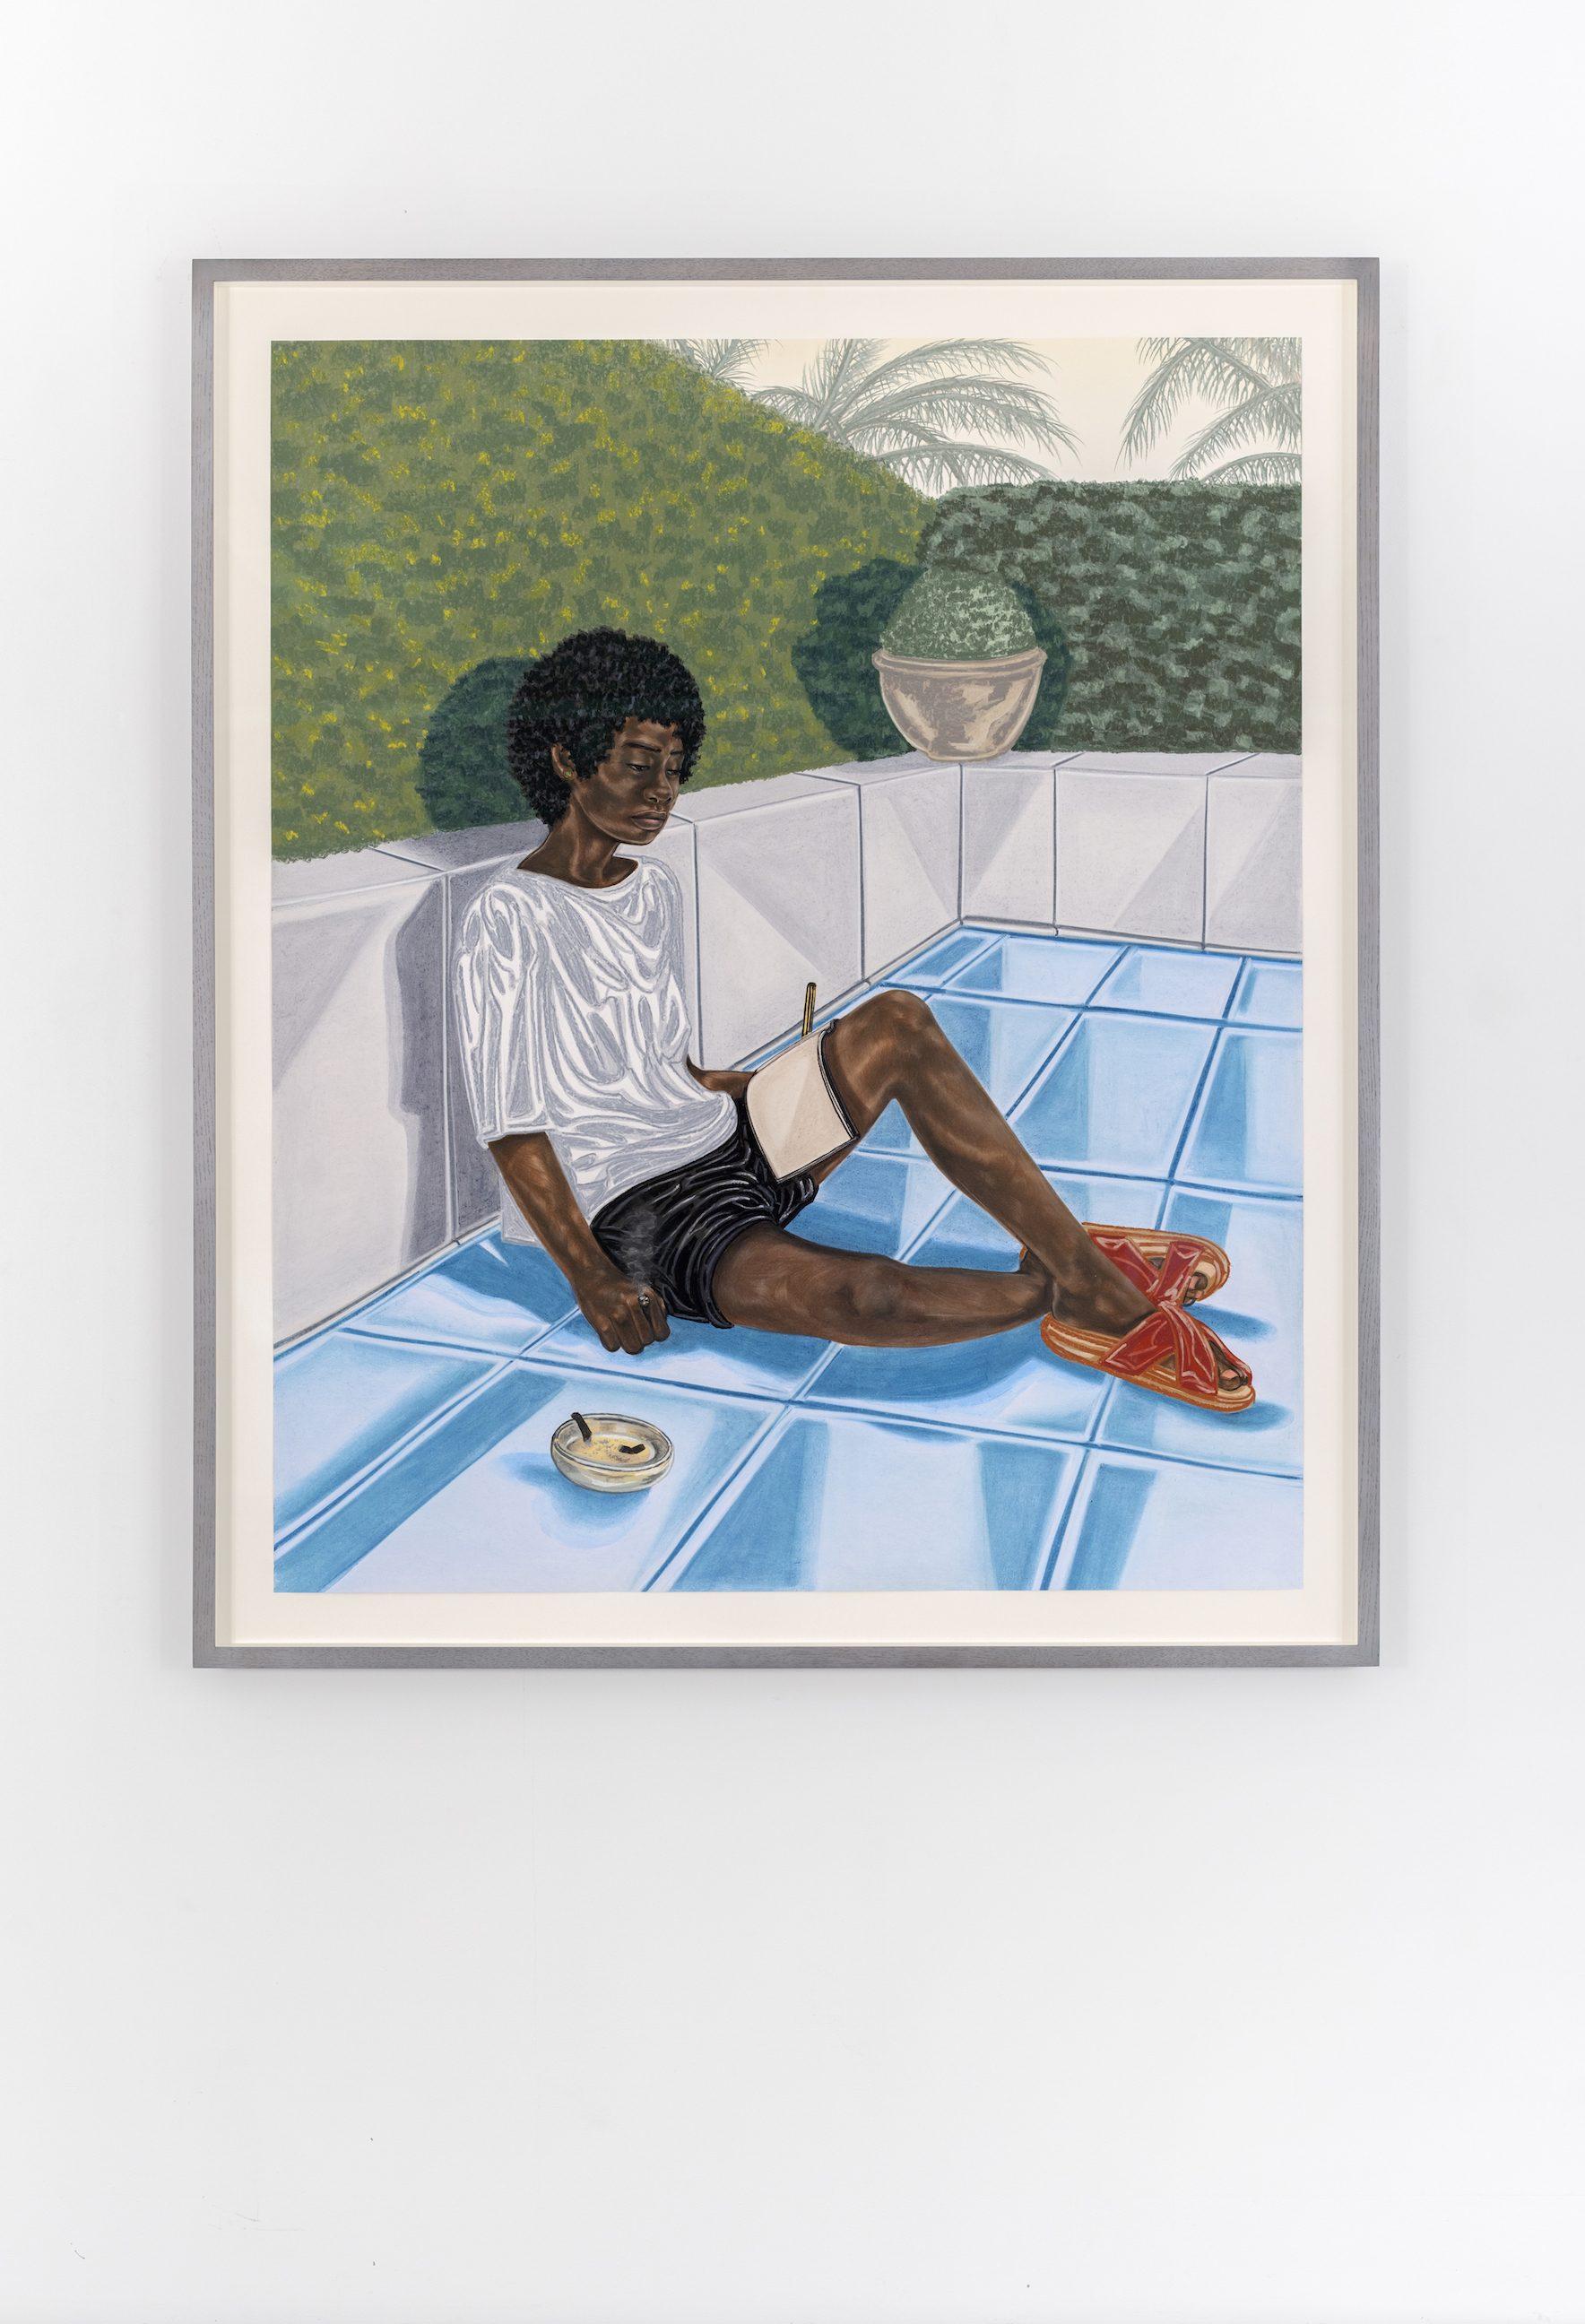 Toyin Ojih Odutola, Hide Out, 2018. © Toyin Ojih Odutola. Courtesy of the artist and Jack Shainman Gallery, New York.